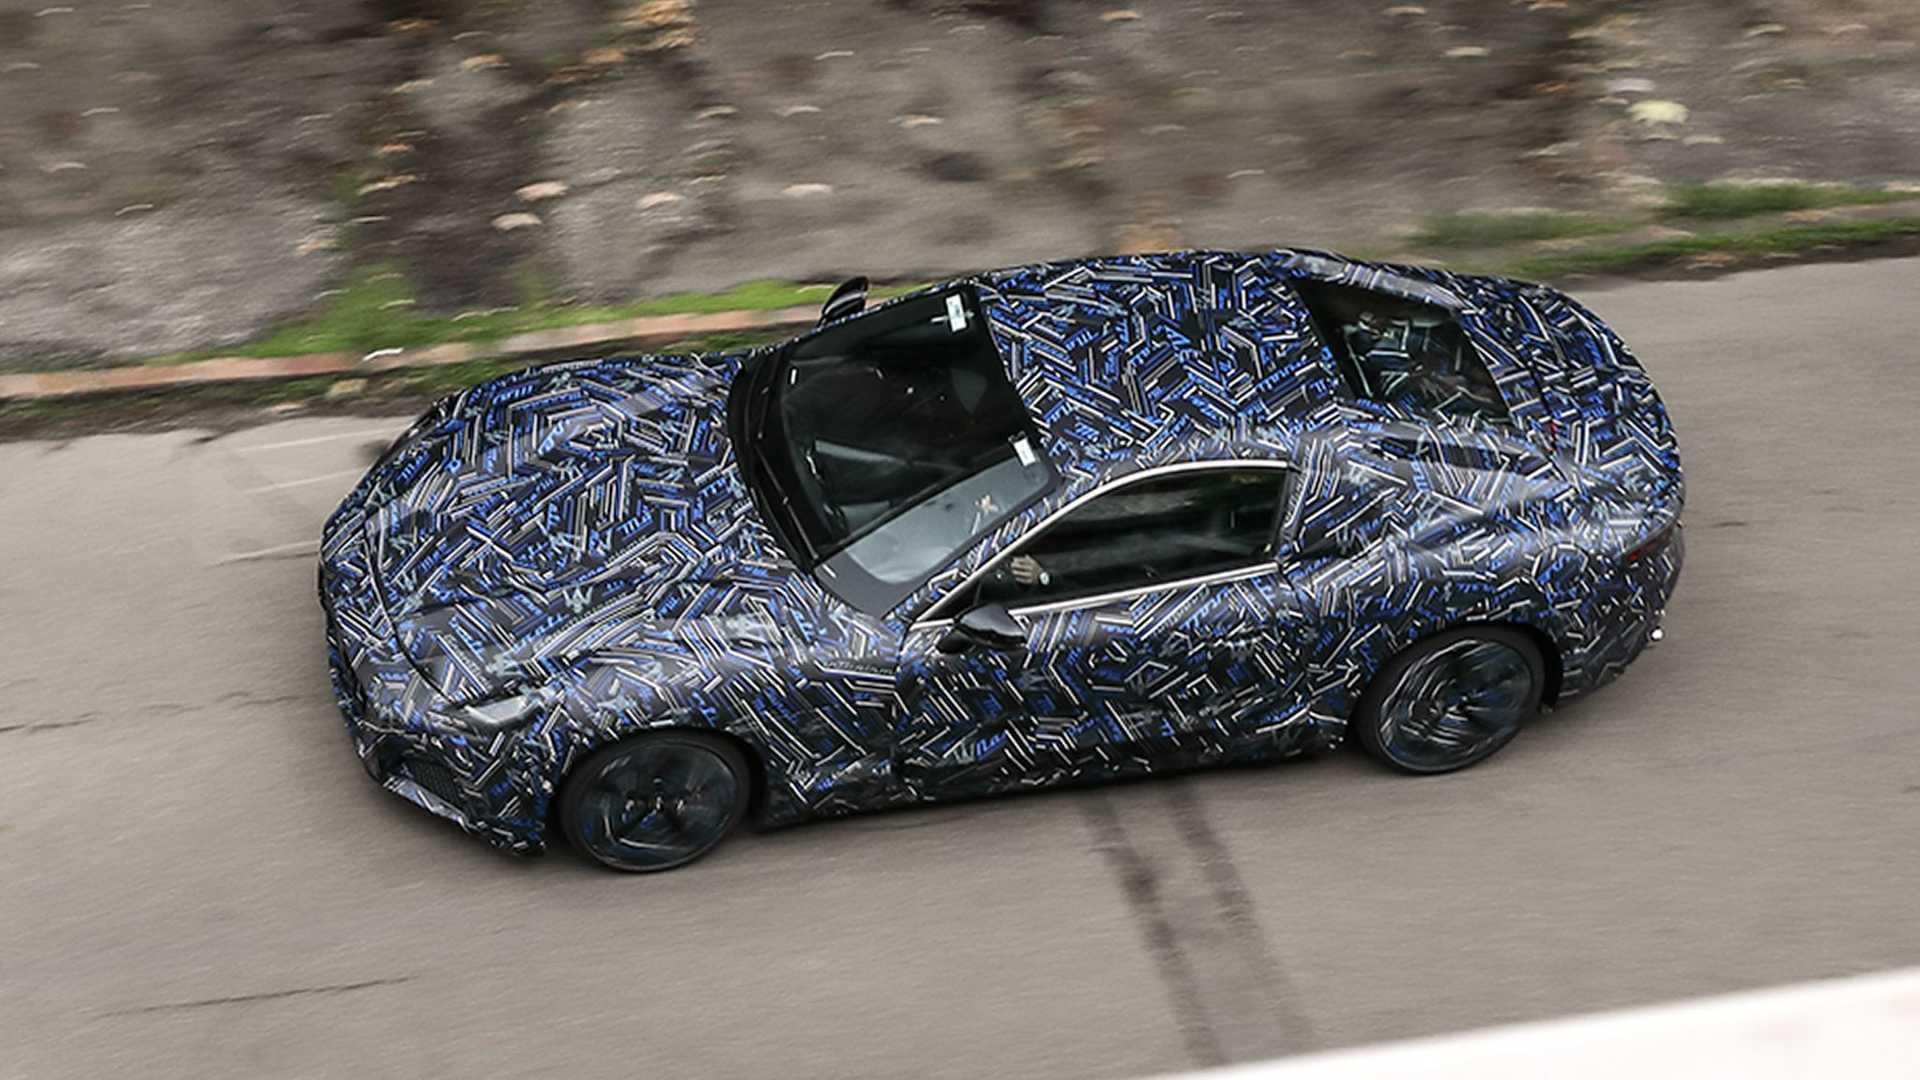 2022 Maserati GranTurismo Teaser imágenes